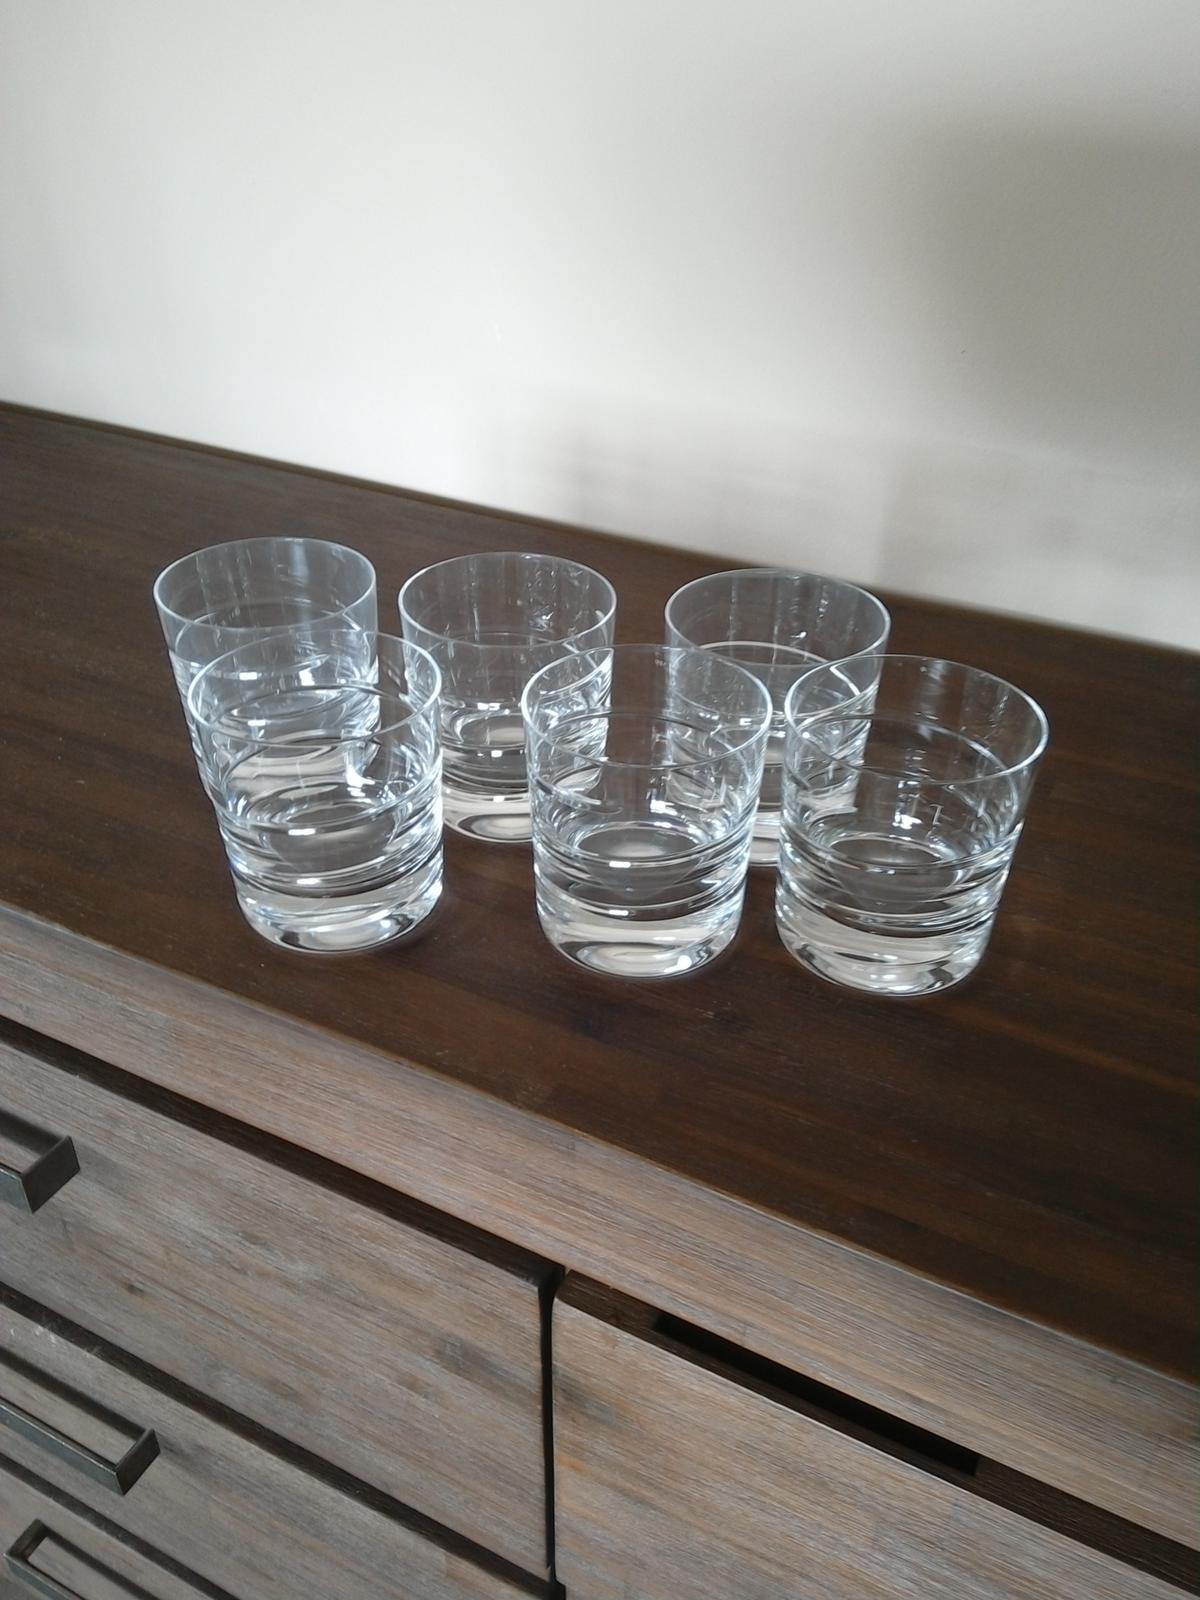 Krištaľove poháre - Obrázok č. 1